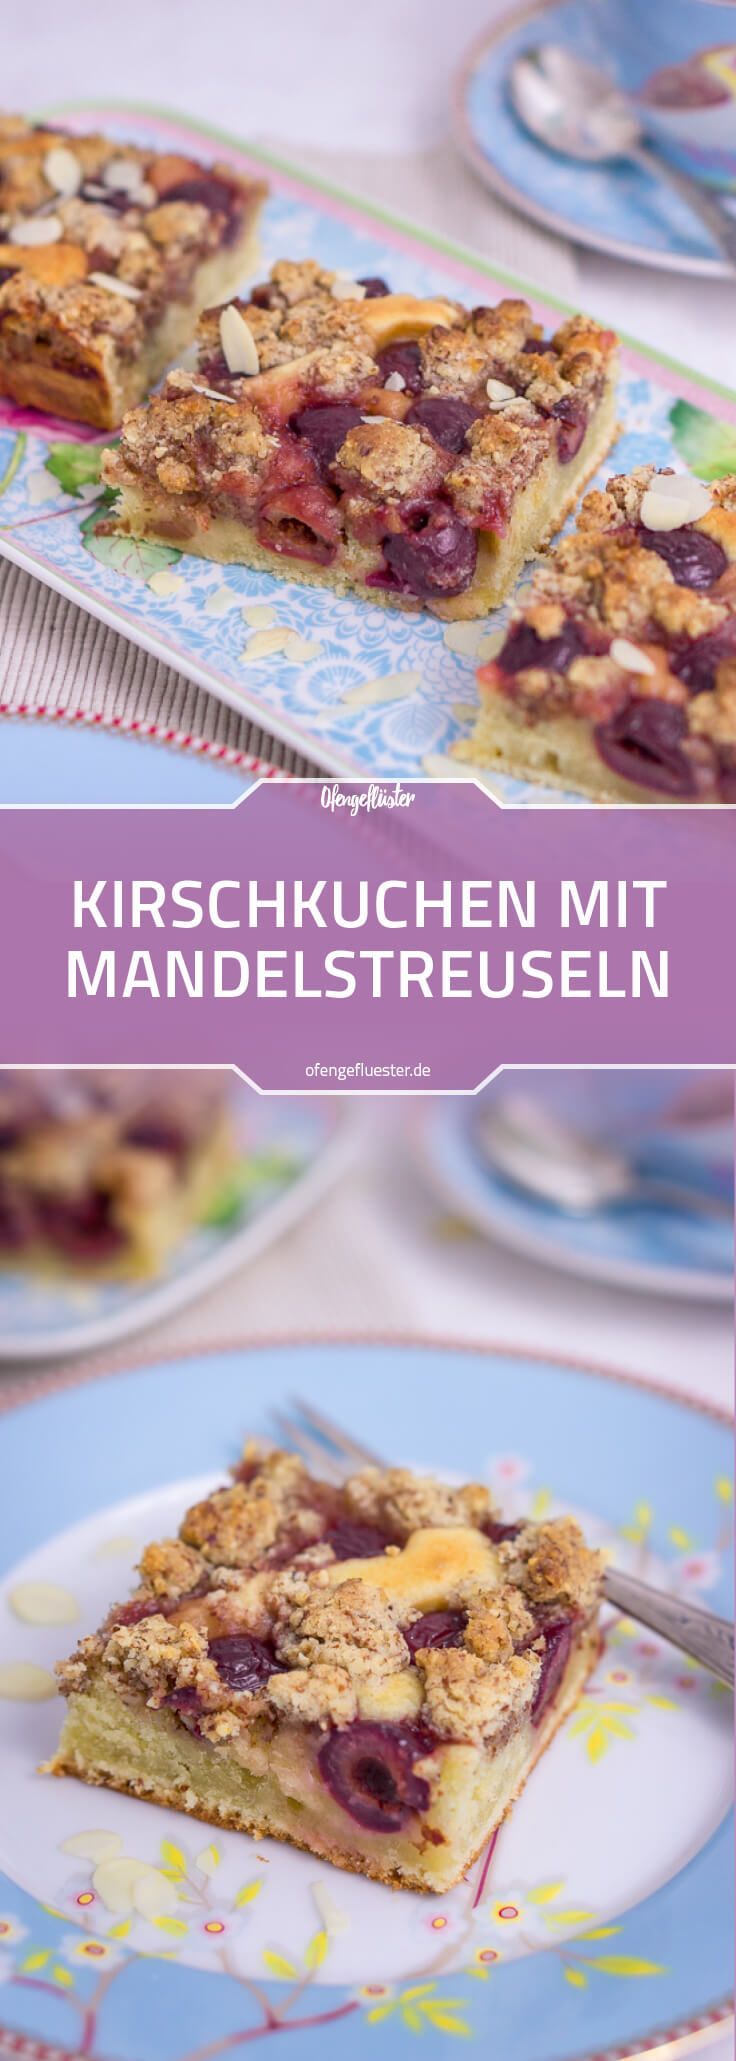 Kirschkuchen mit Mandelstreuseln vom Blech – Blogger Summer Vibes